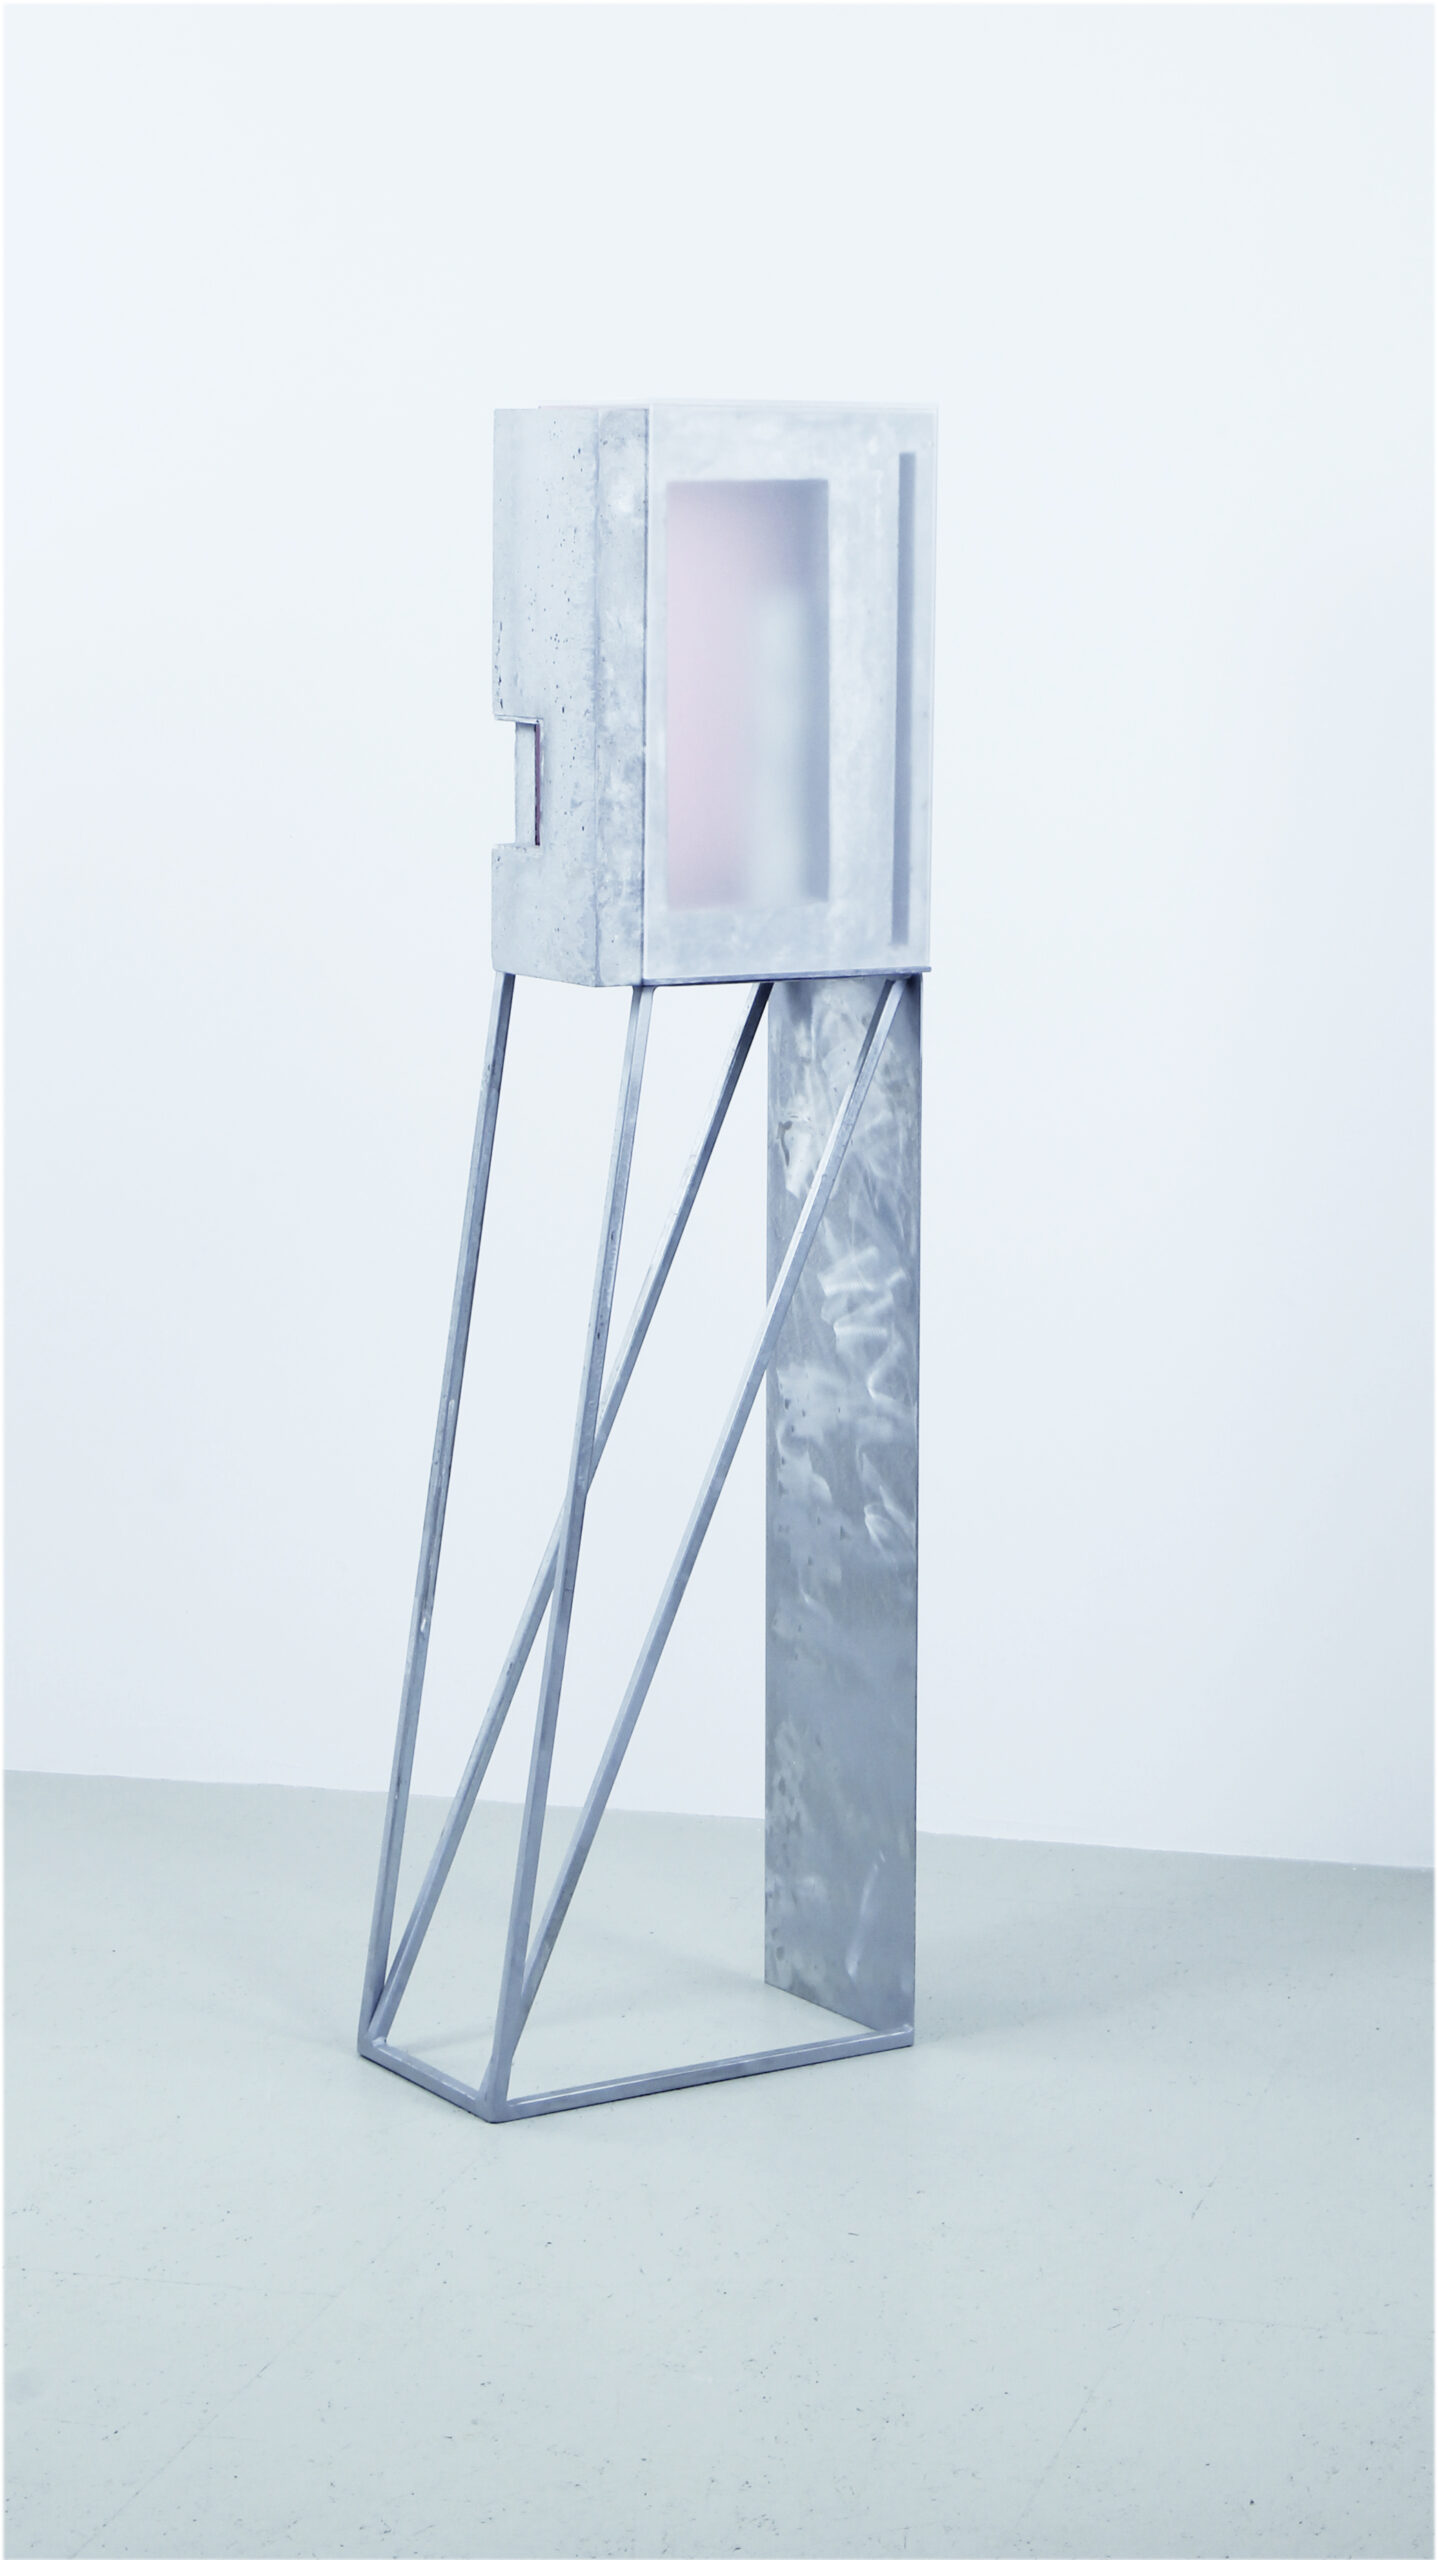 translucide III | 2020 | Beton/Acrylglas/Metall | 29 x 45 x 150 cm